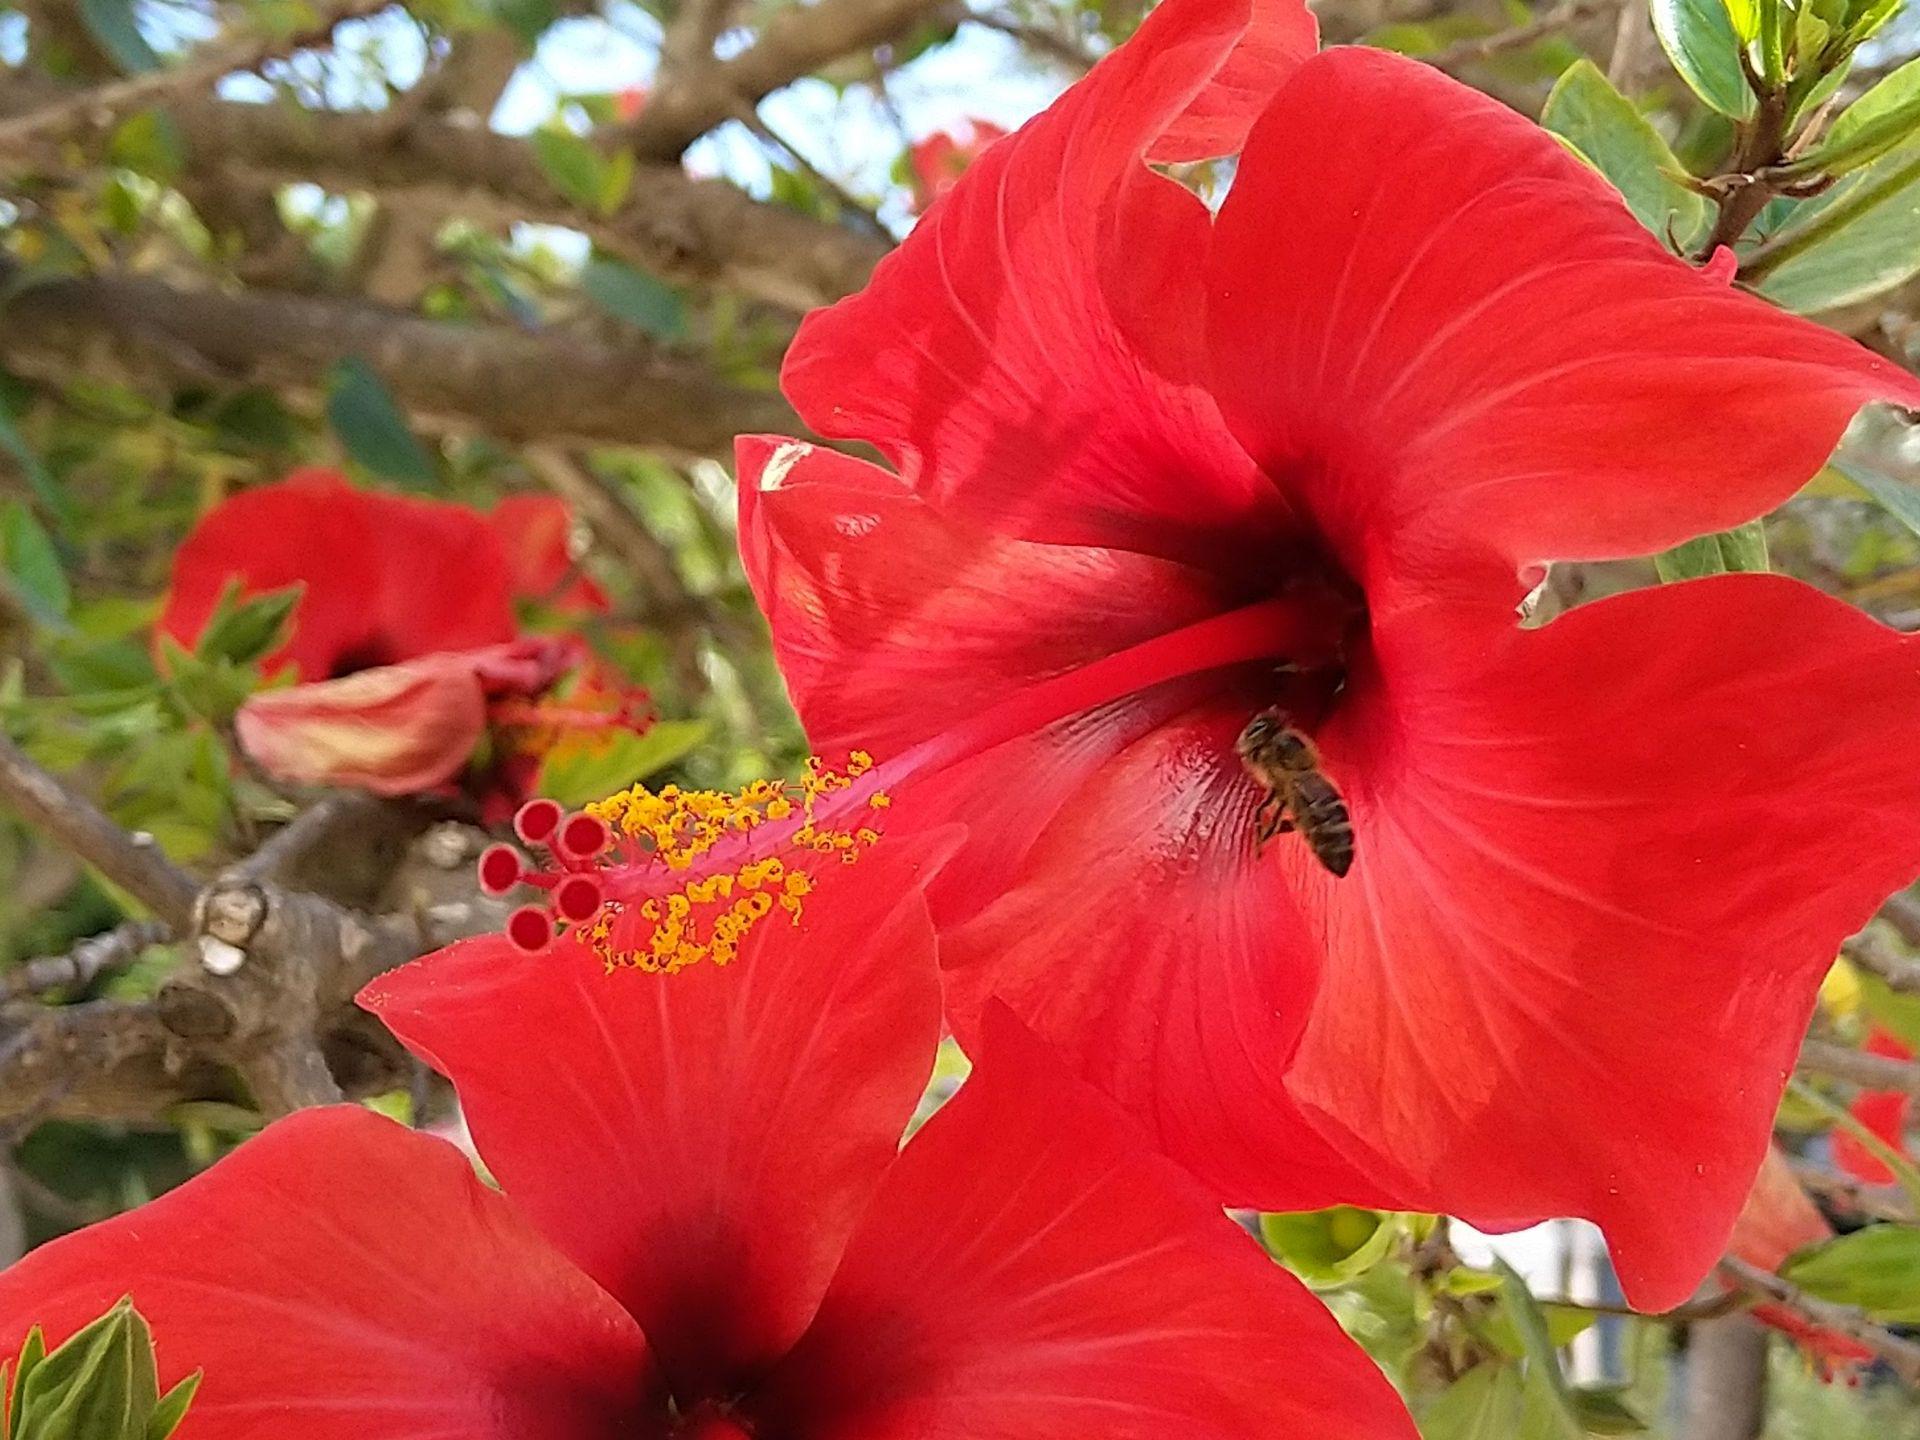 aecco_flowerbee_1920x1440px.jpg